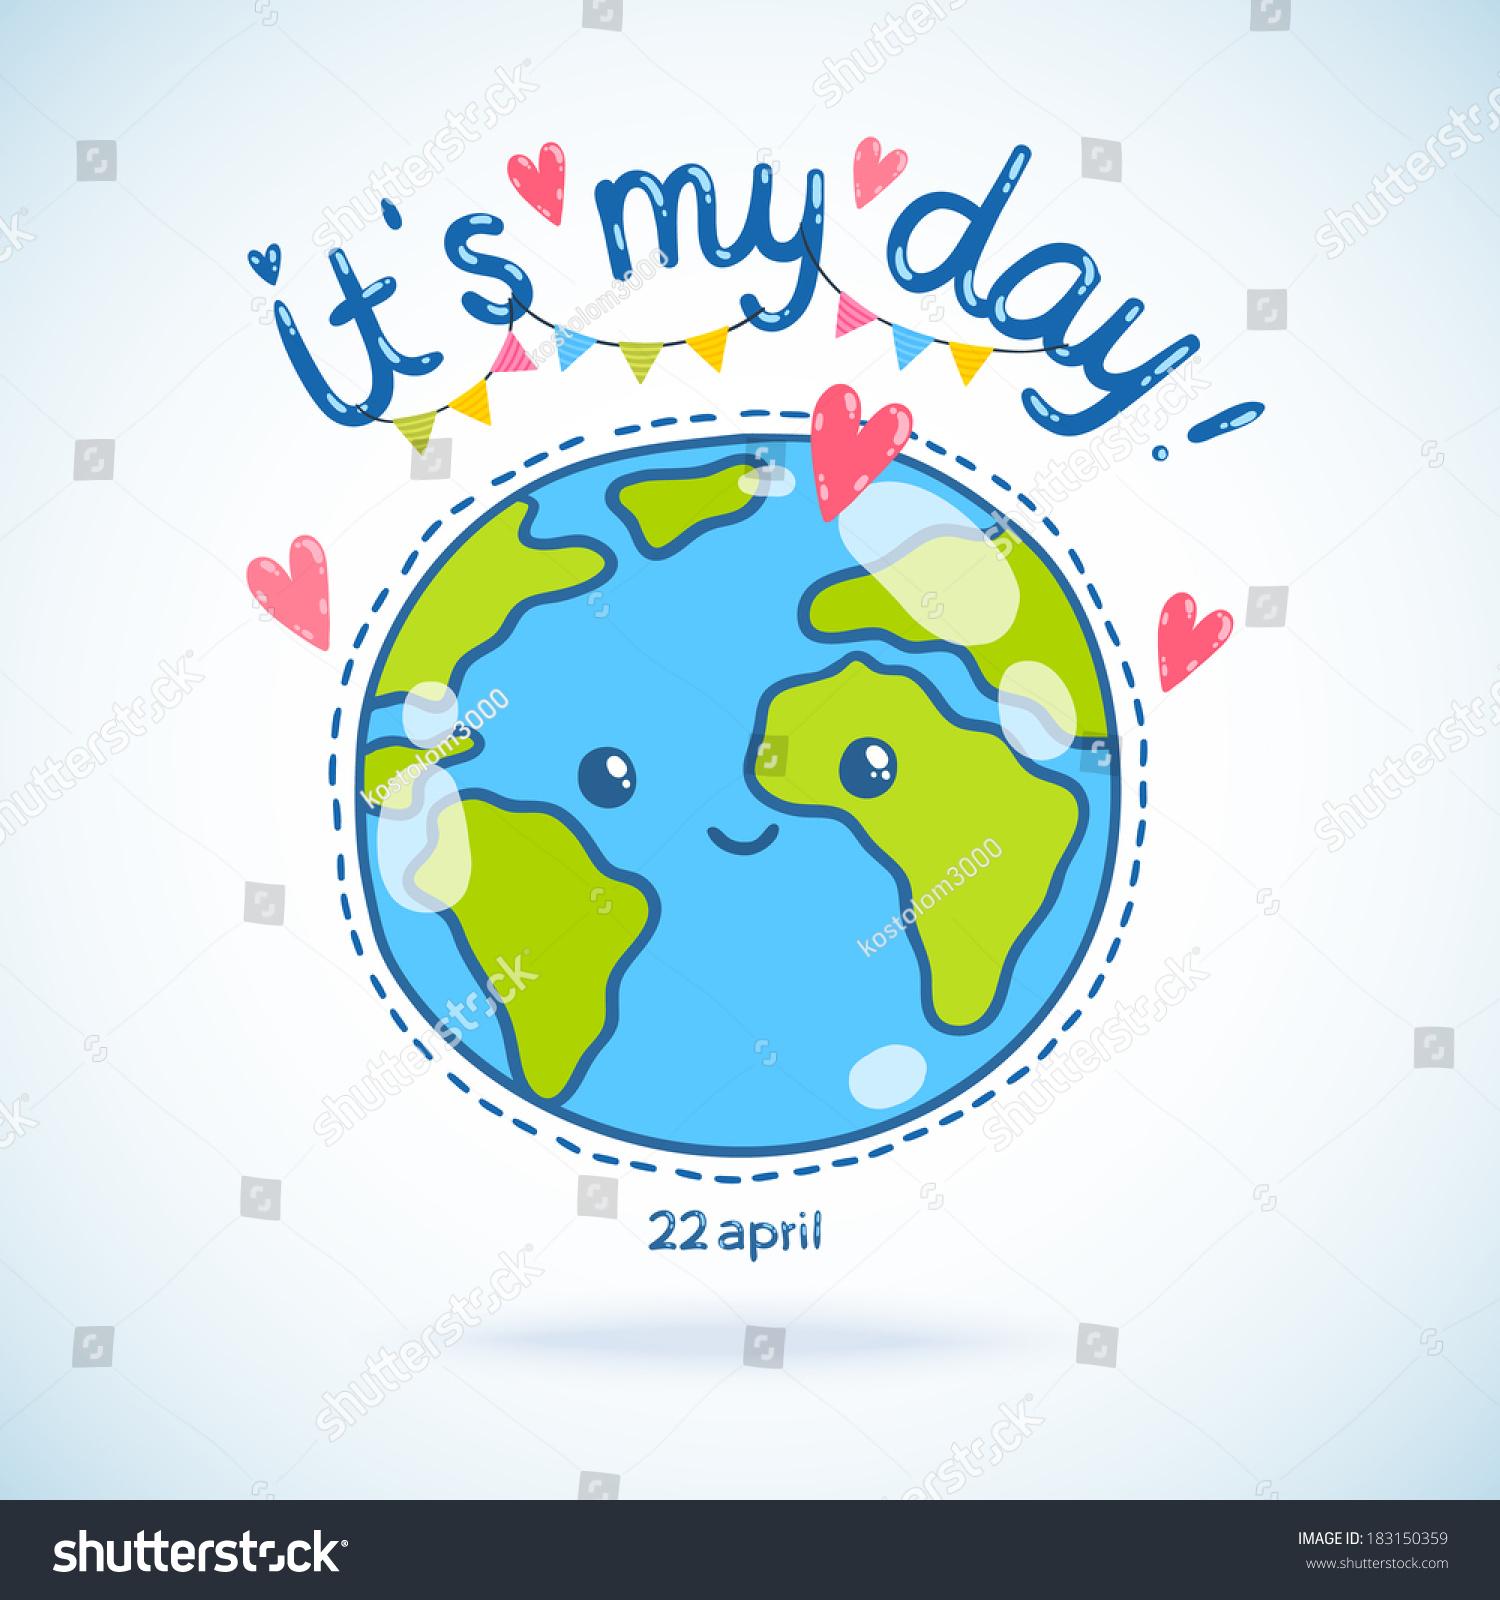 cute cartoon earth globe postcard  earth day background  stock vector illustration 183150359